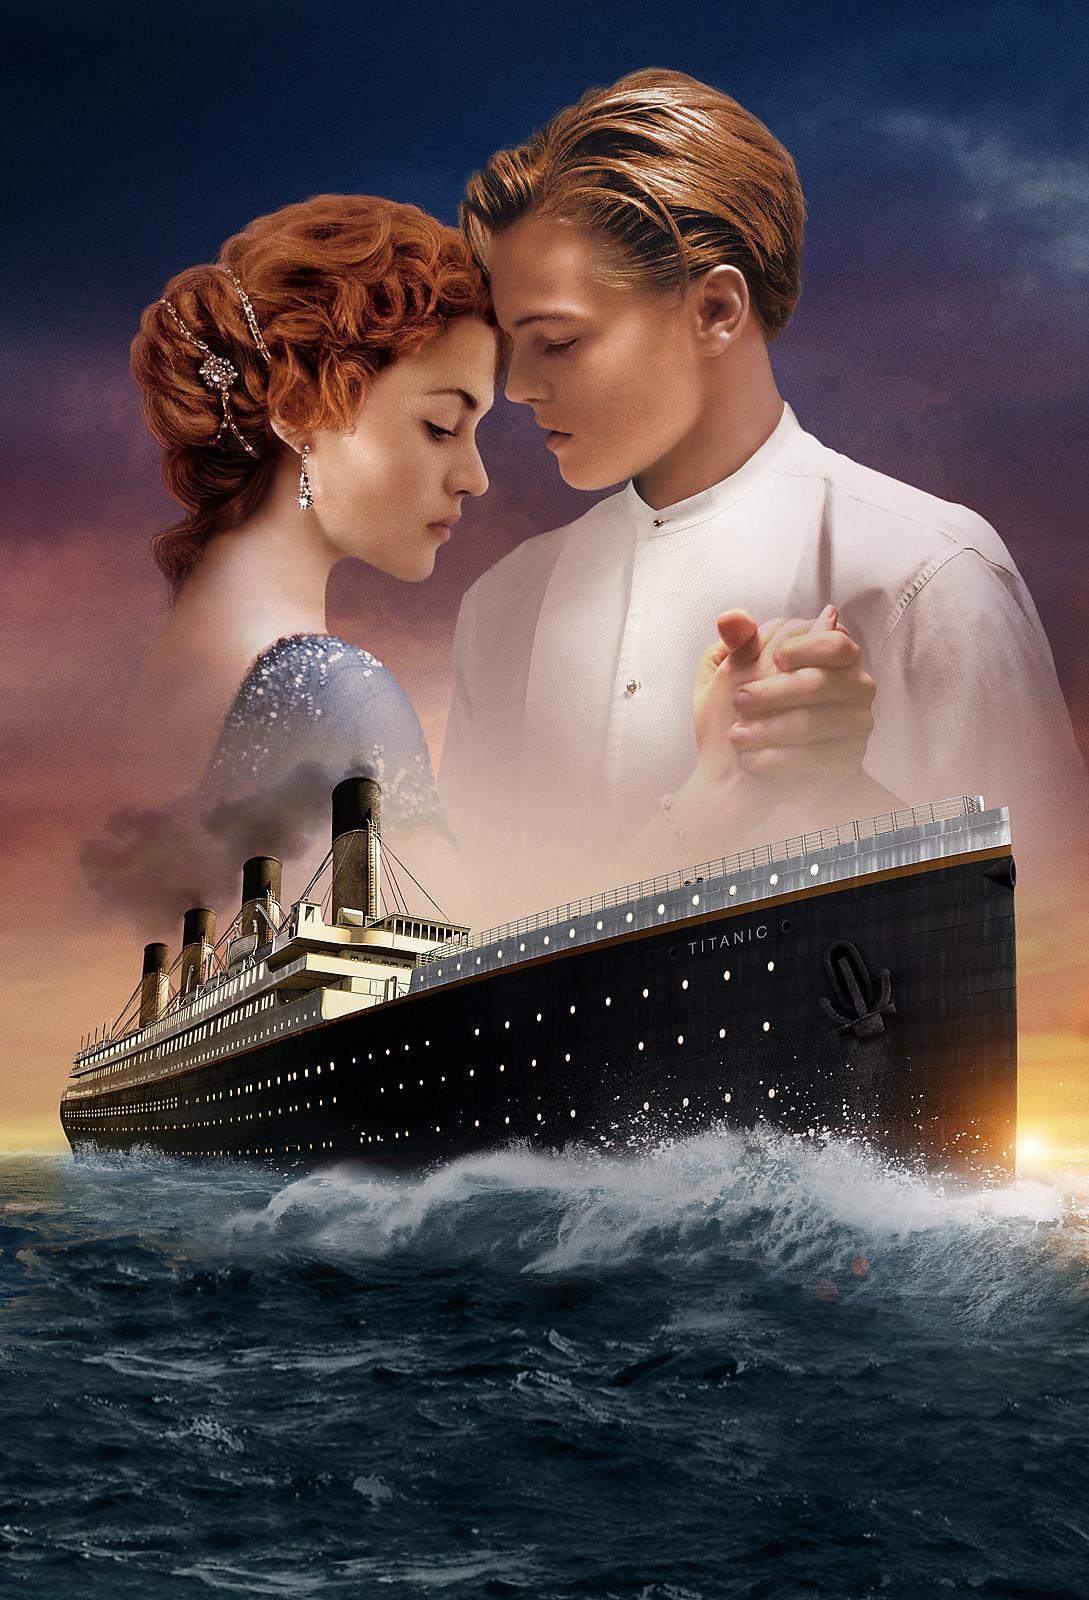 titanic-movie-photos-Titanic-Movie-Couples-Fan-Art-Fanpop-fanclubs-wallpaper-wp4210017